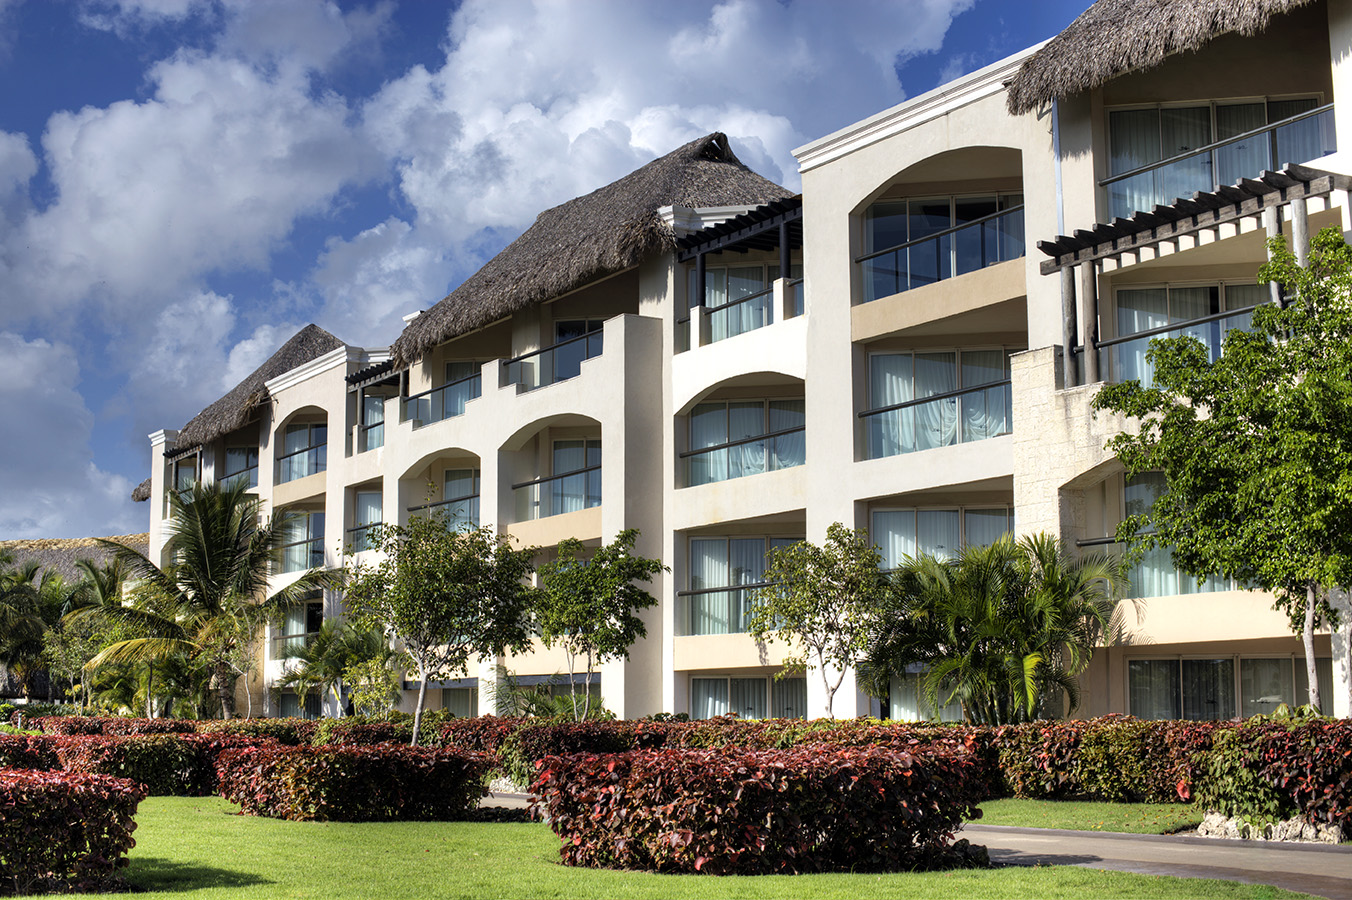 Hard Rock Resort Building - Punta Cana, DR